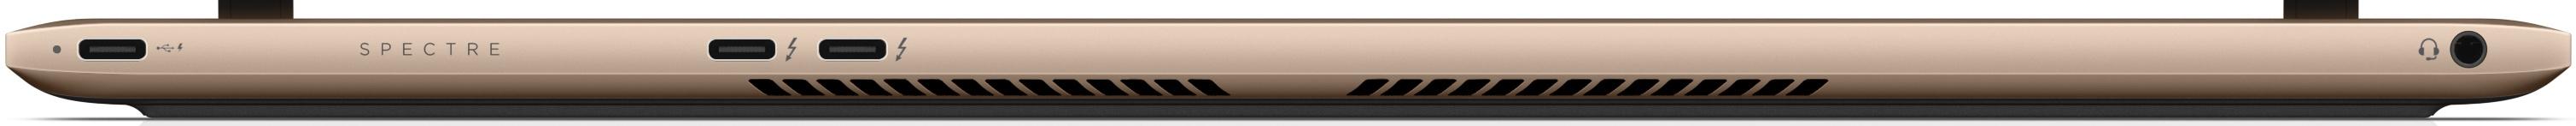 Zadná strana s portami, trojica USB-C a audioport